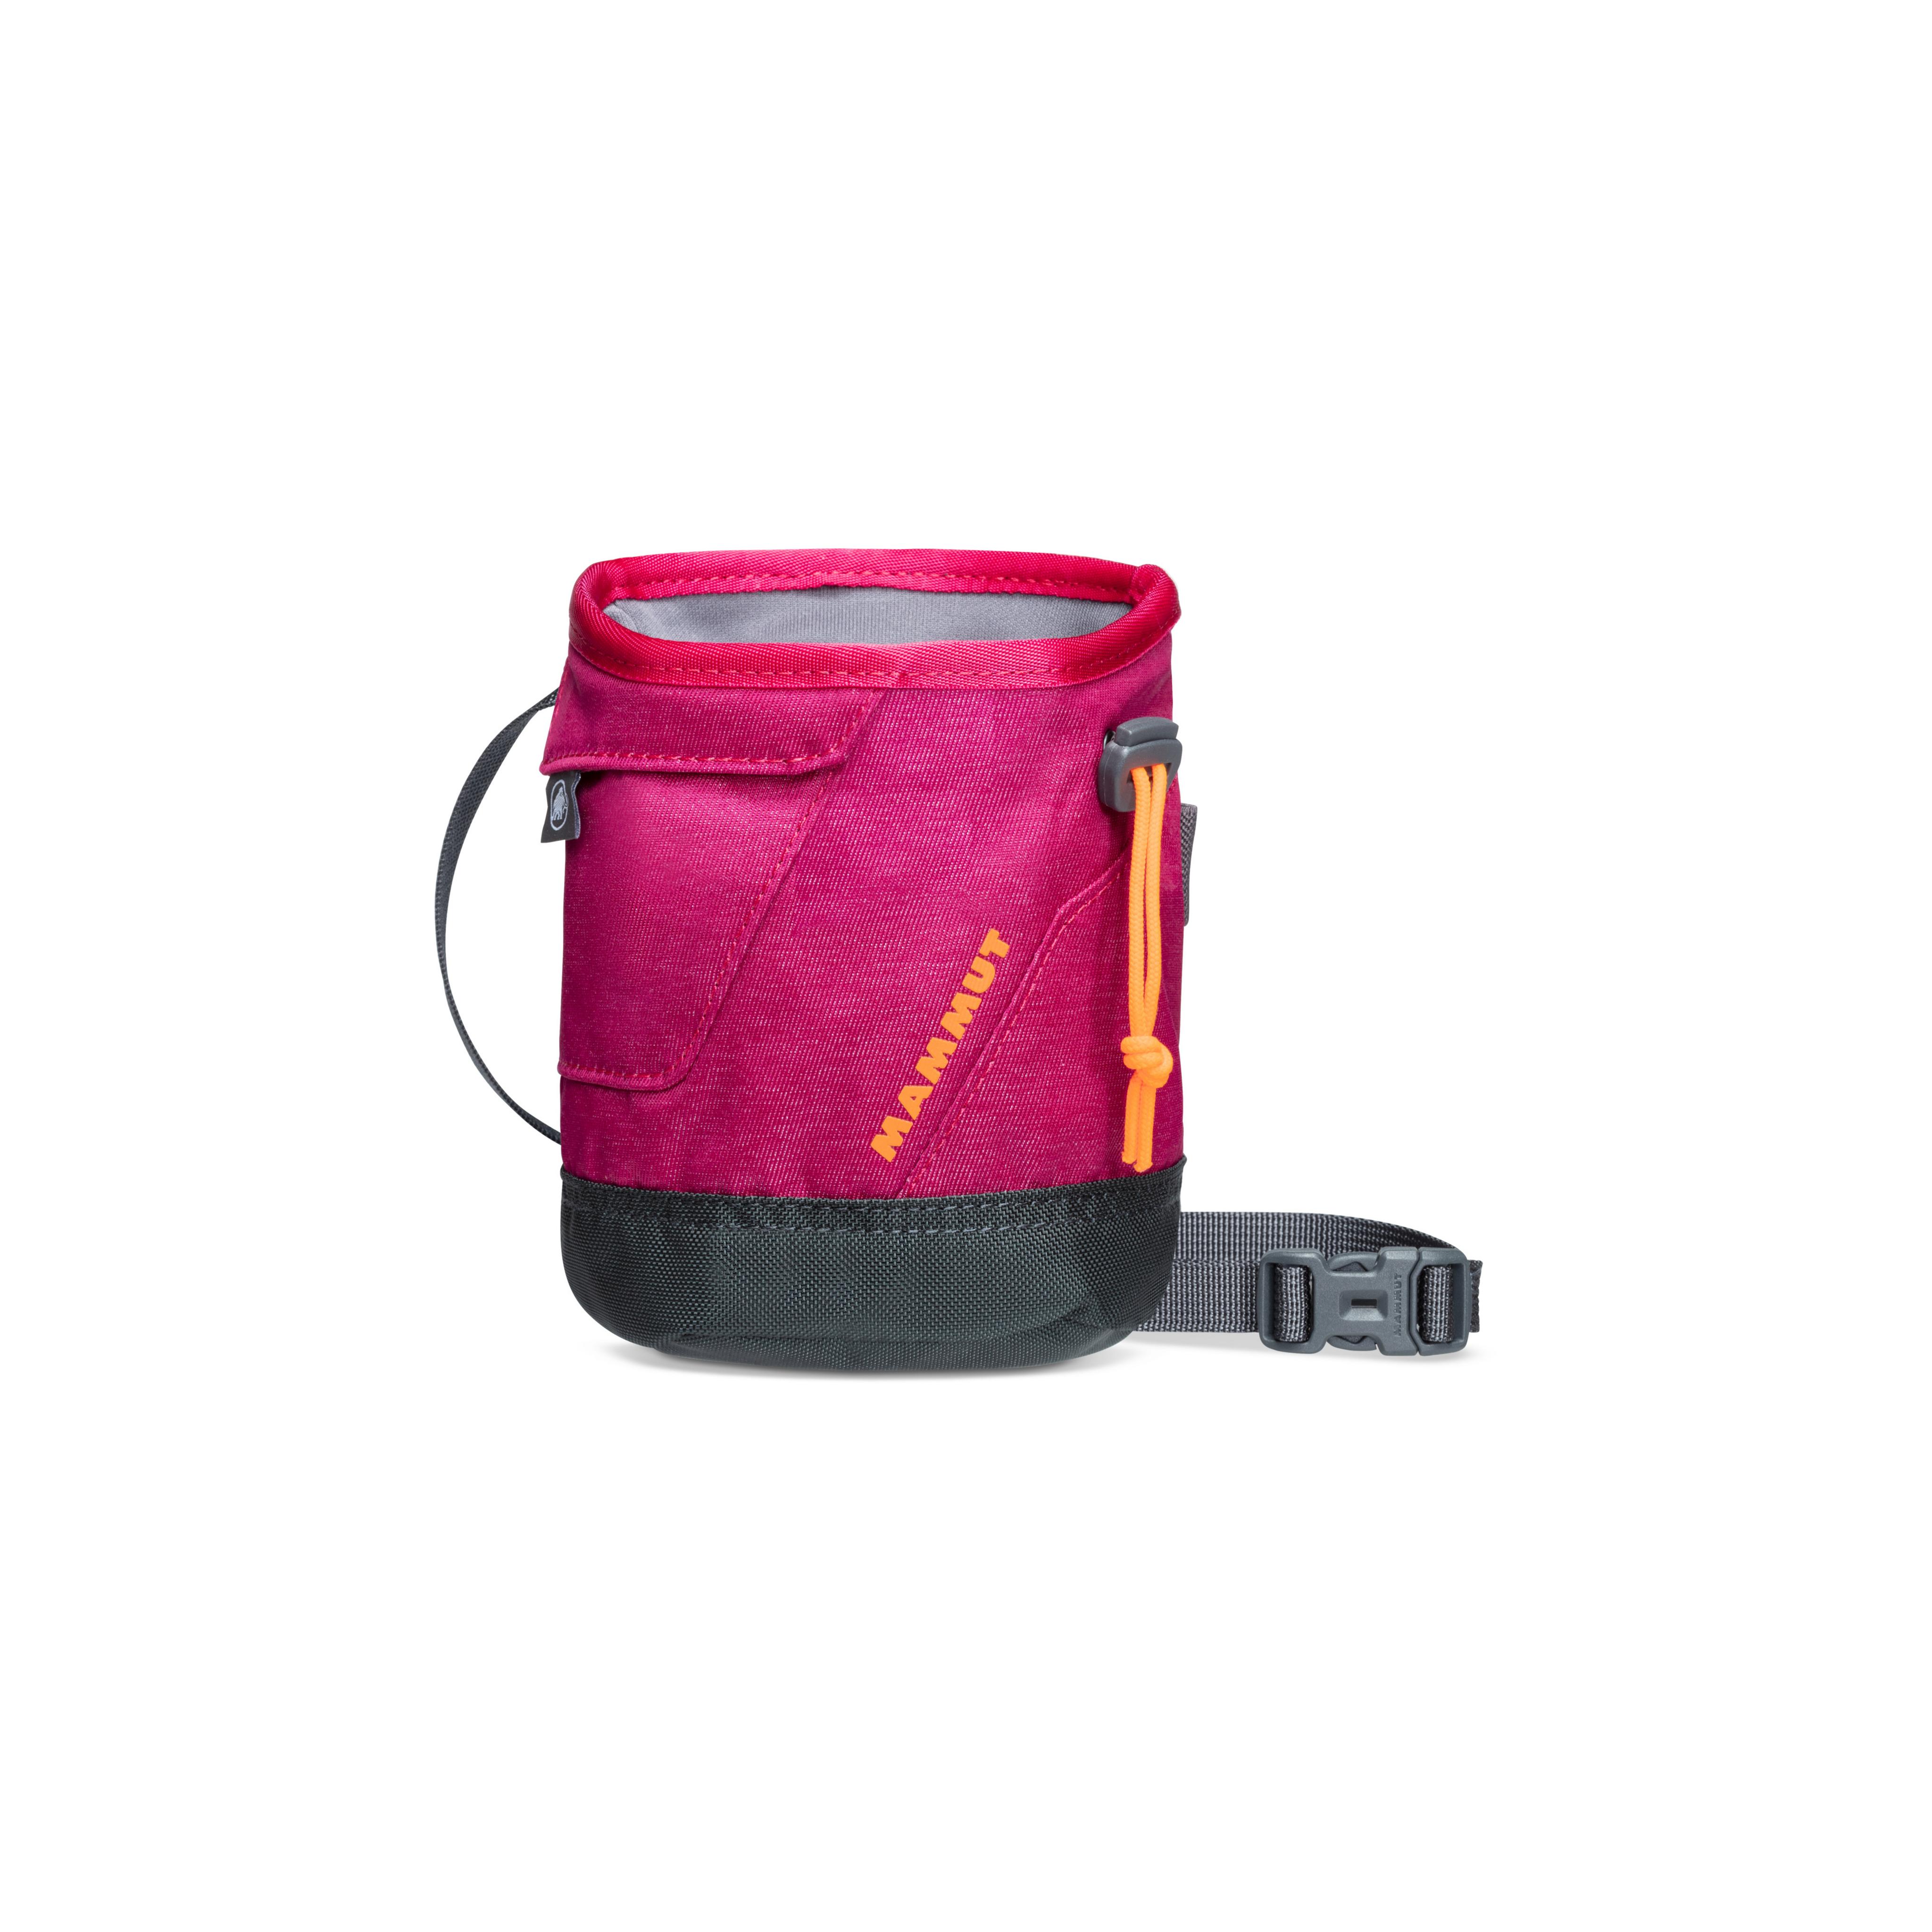 Ophir Chalk Bag - one size, sundown thumbnail